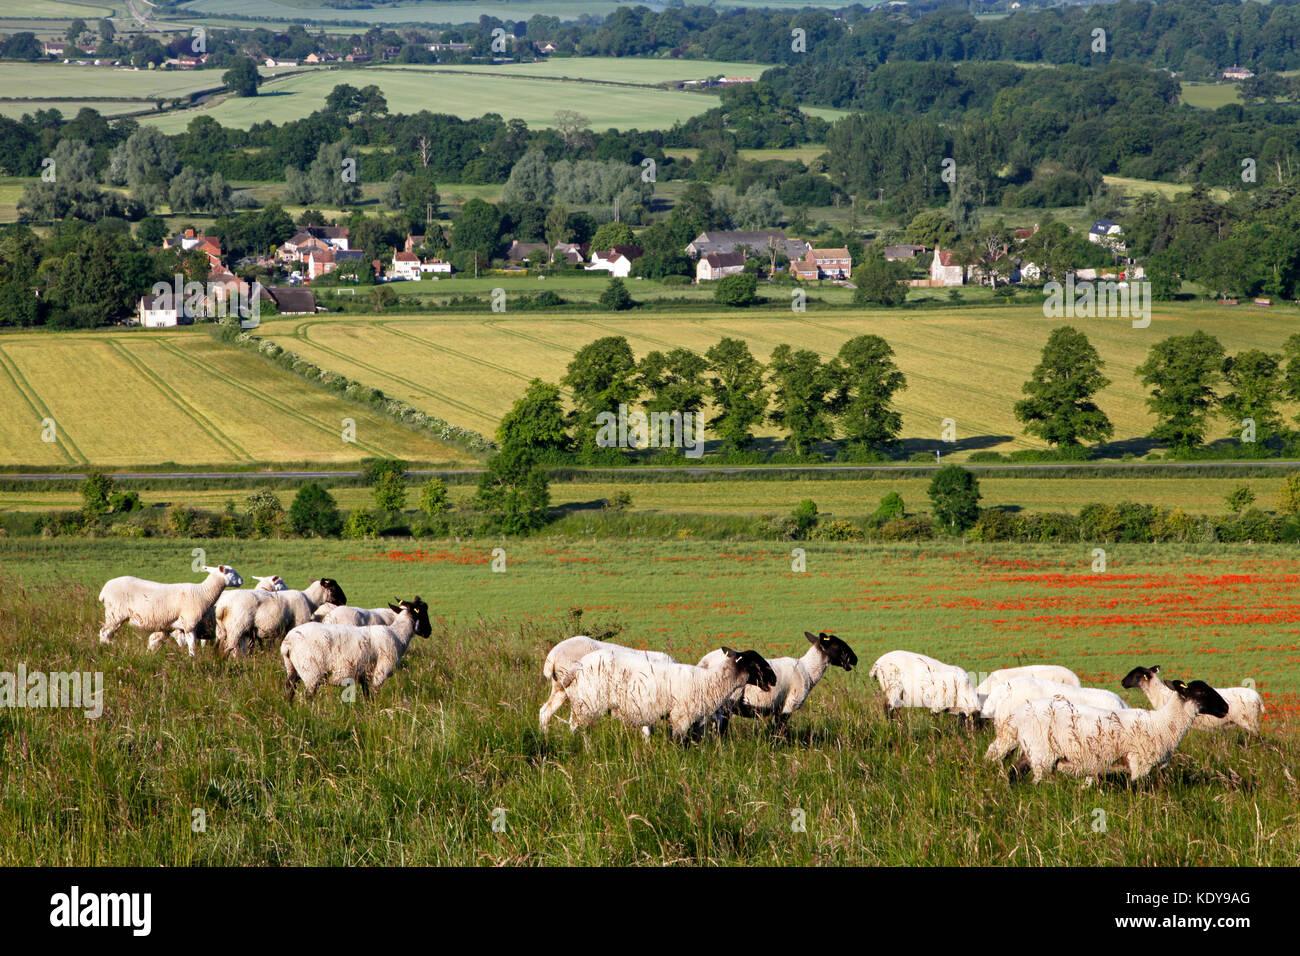 Sheep grazing on Scratchbury Hill, near Warminster in Wiltshire, overlooking the village of Norton Bavant. Stock Photo